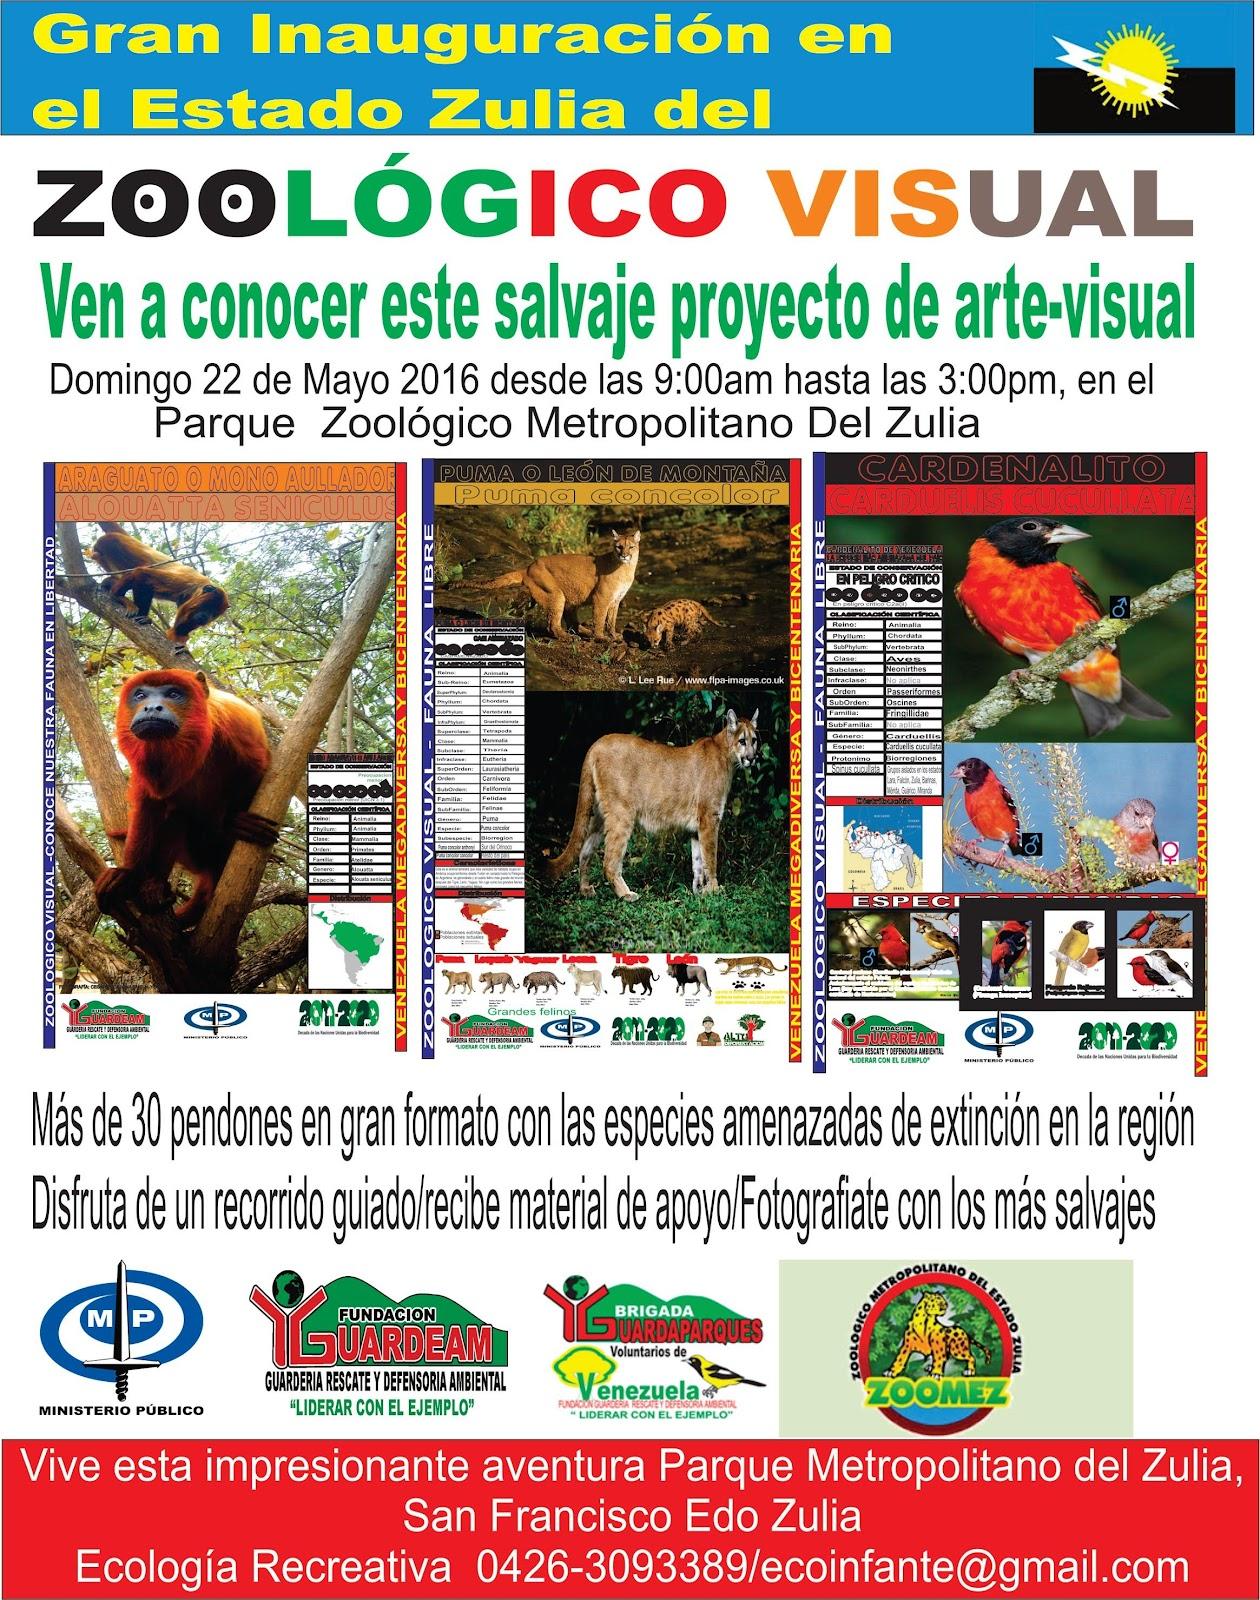 F:cartel zoo visual zulia 22-05-2016.jpg